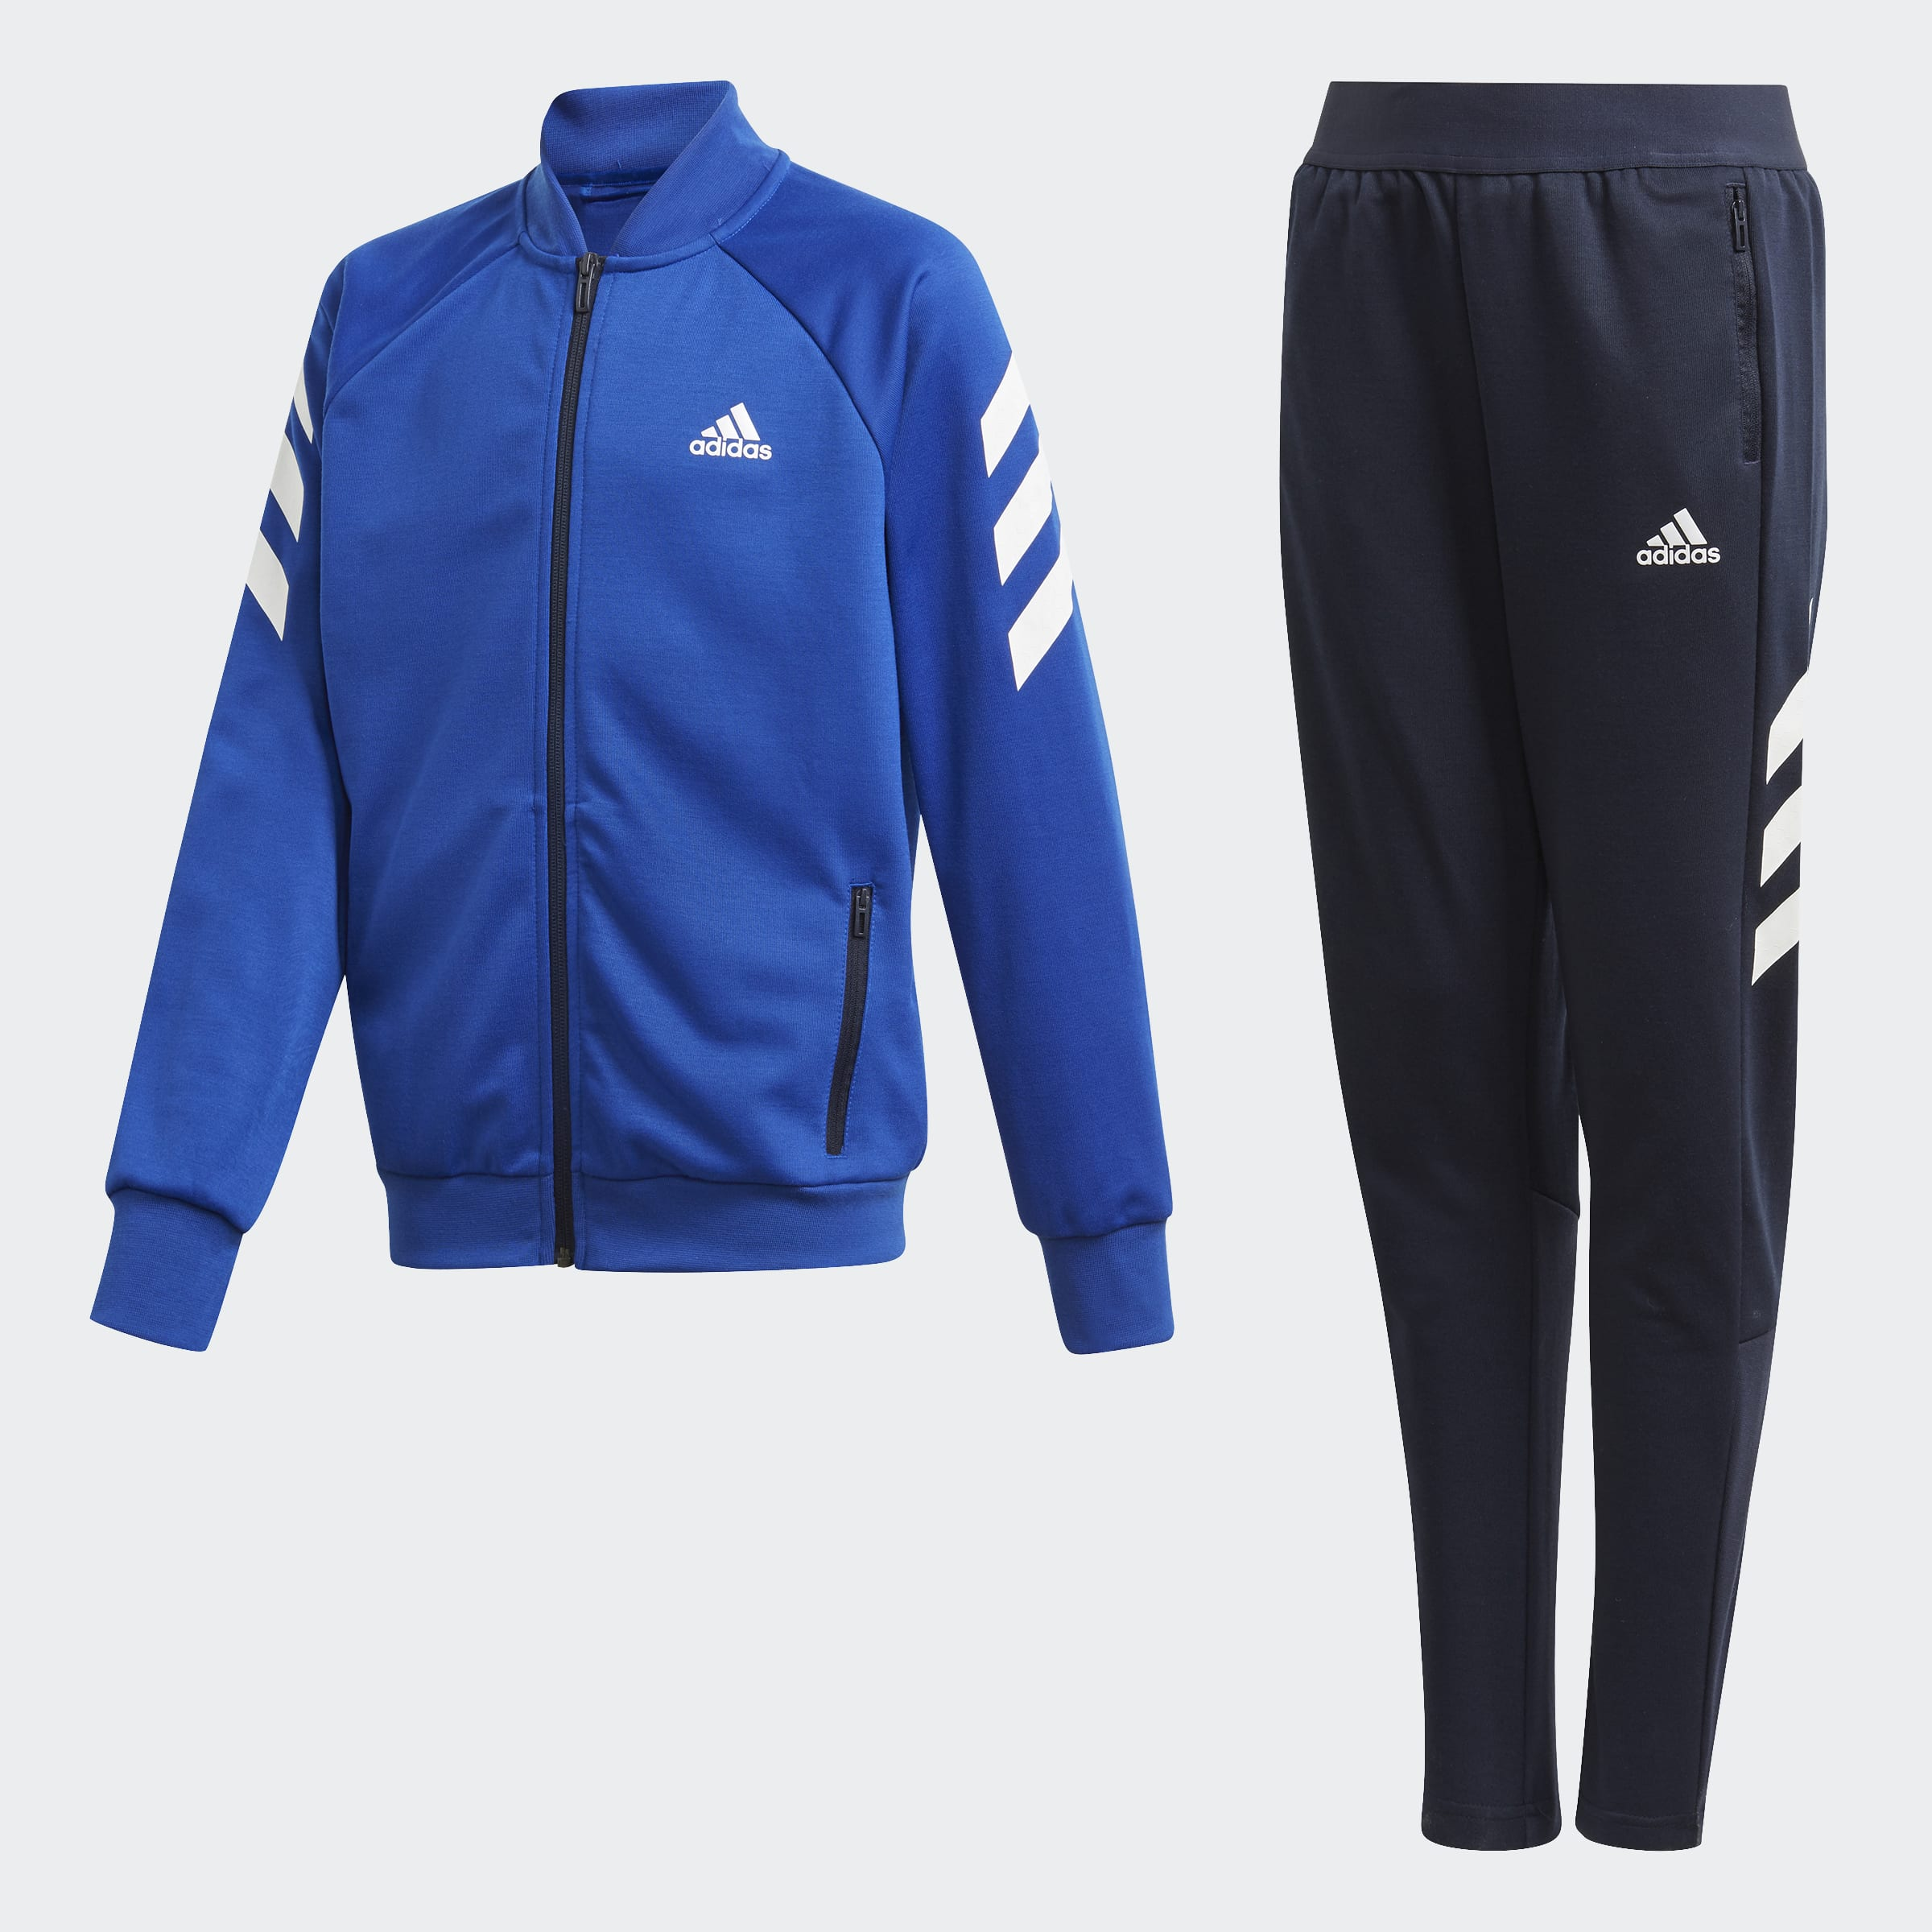 adidas Performance Trainingsanzug XFG, (Set, 2 tlg.)